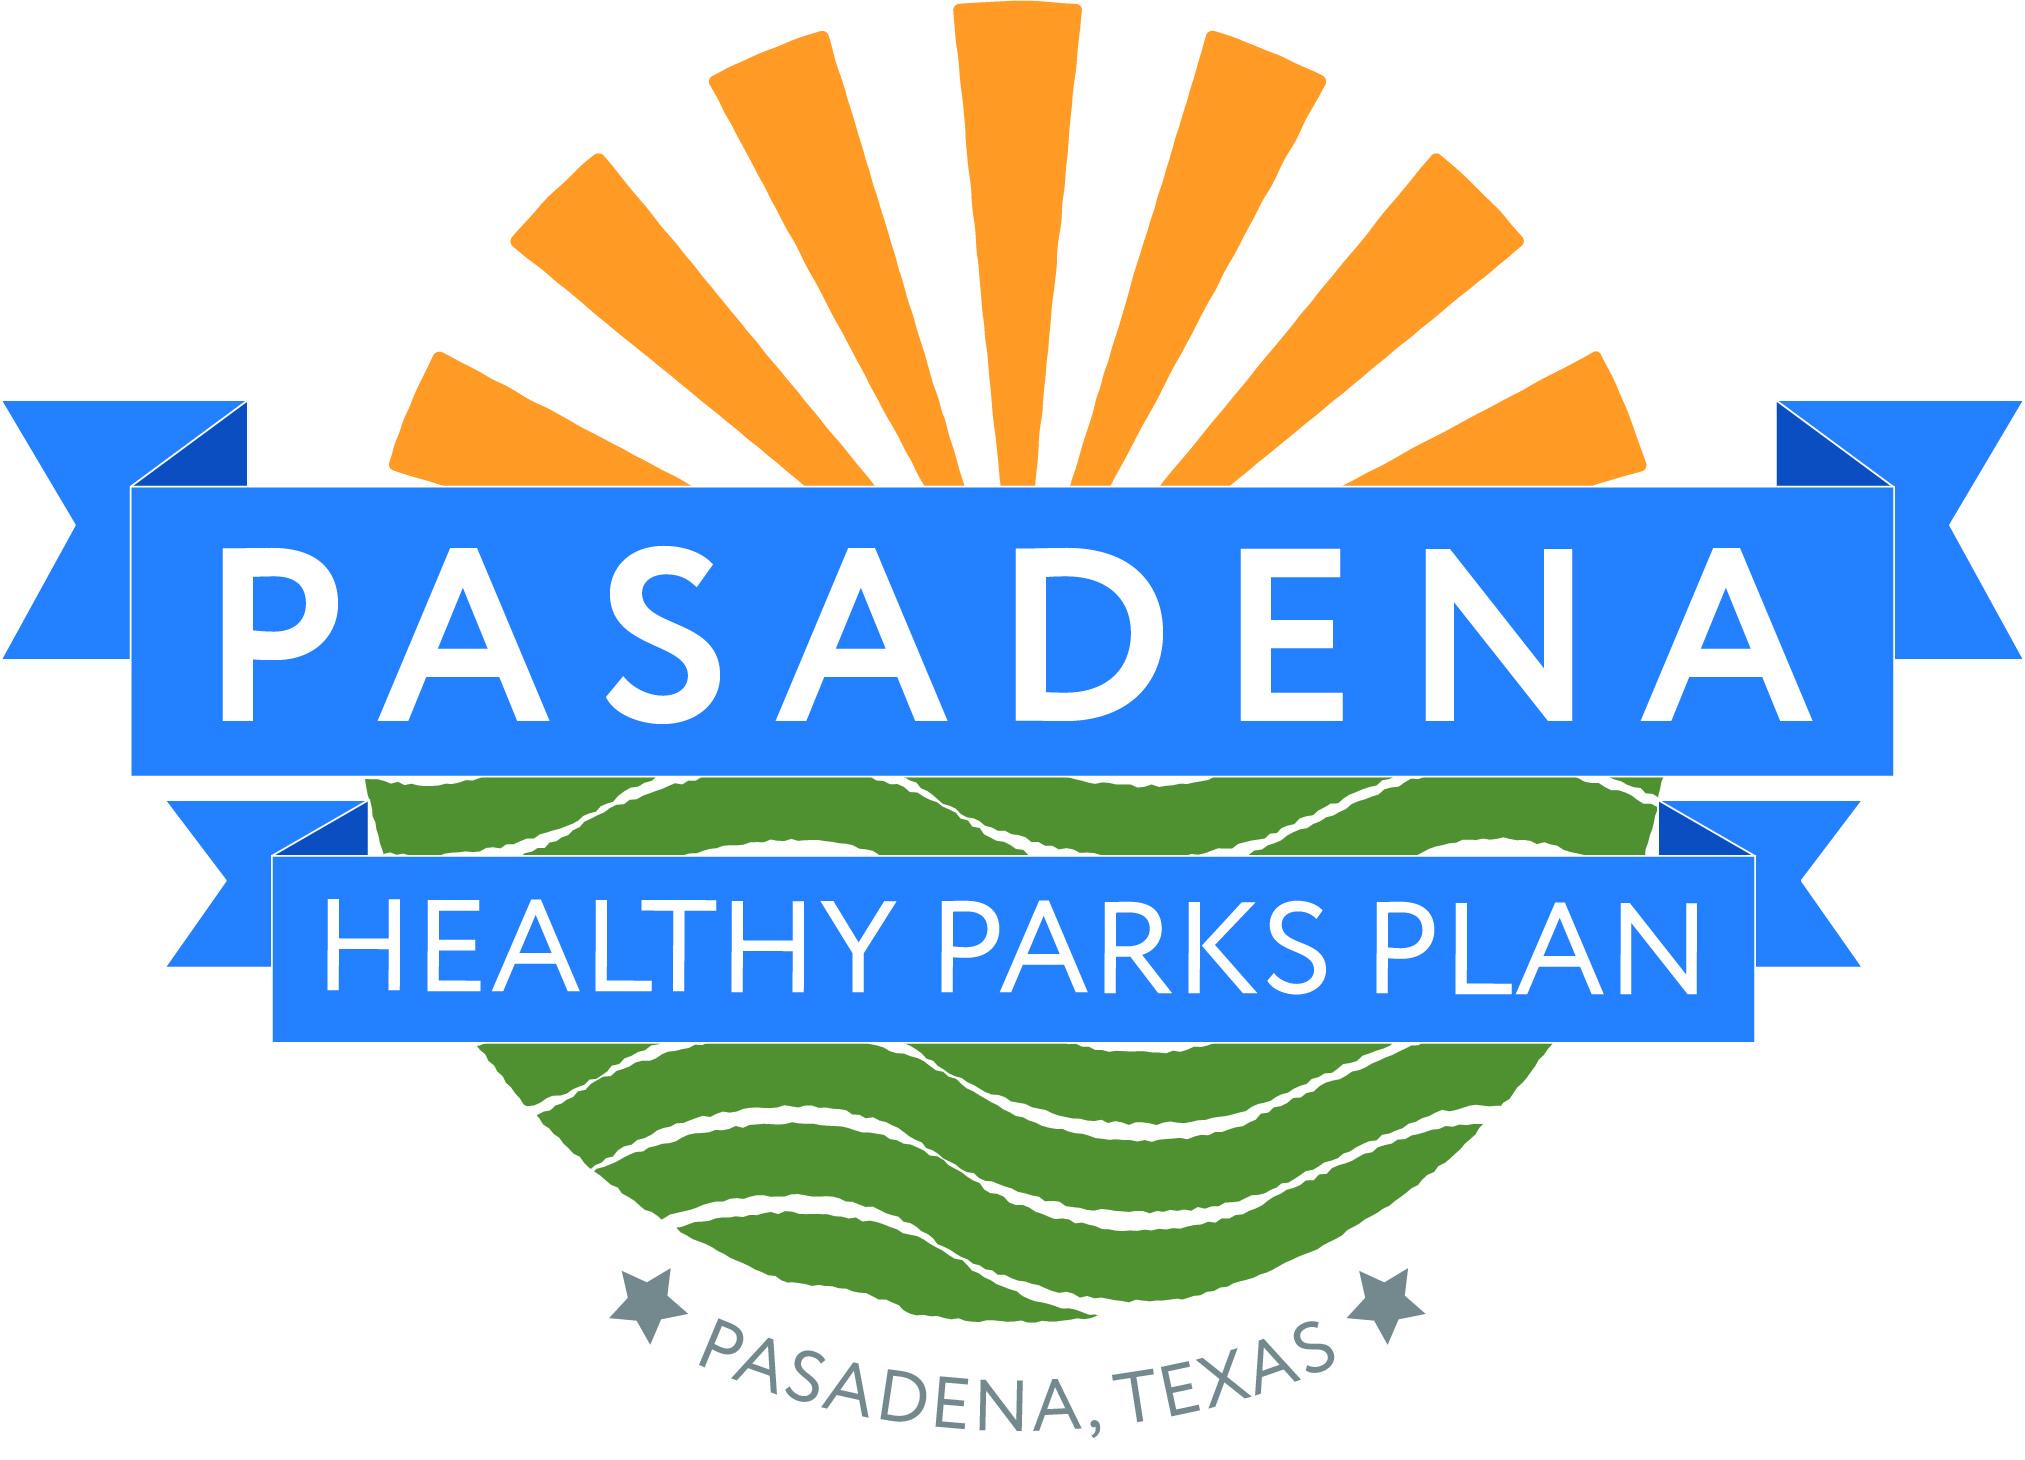 Pasadena Healthy Parks Plan Press Release